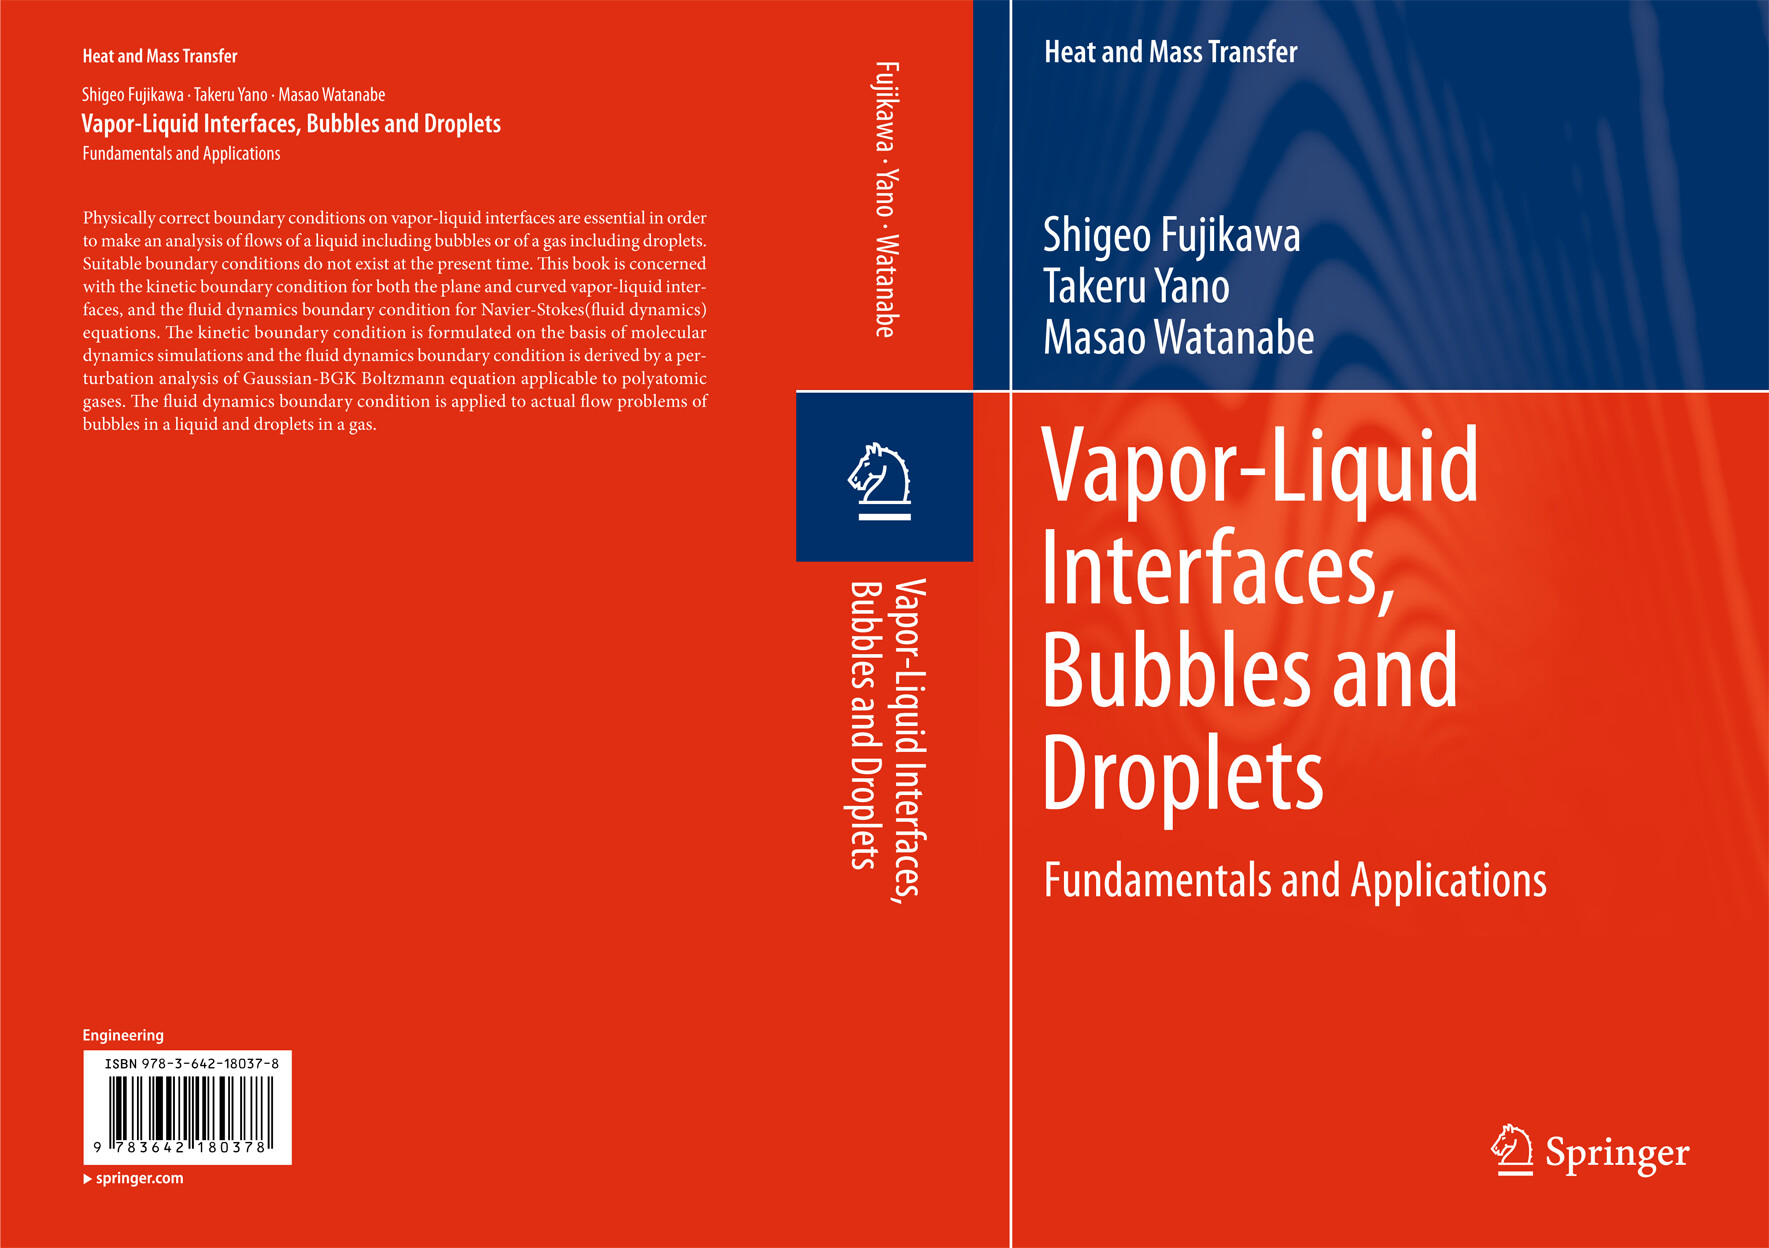 Vapor-Liquid Interfaces, Bubbles and Droplets